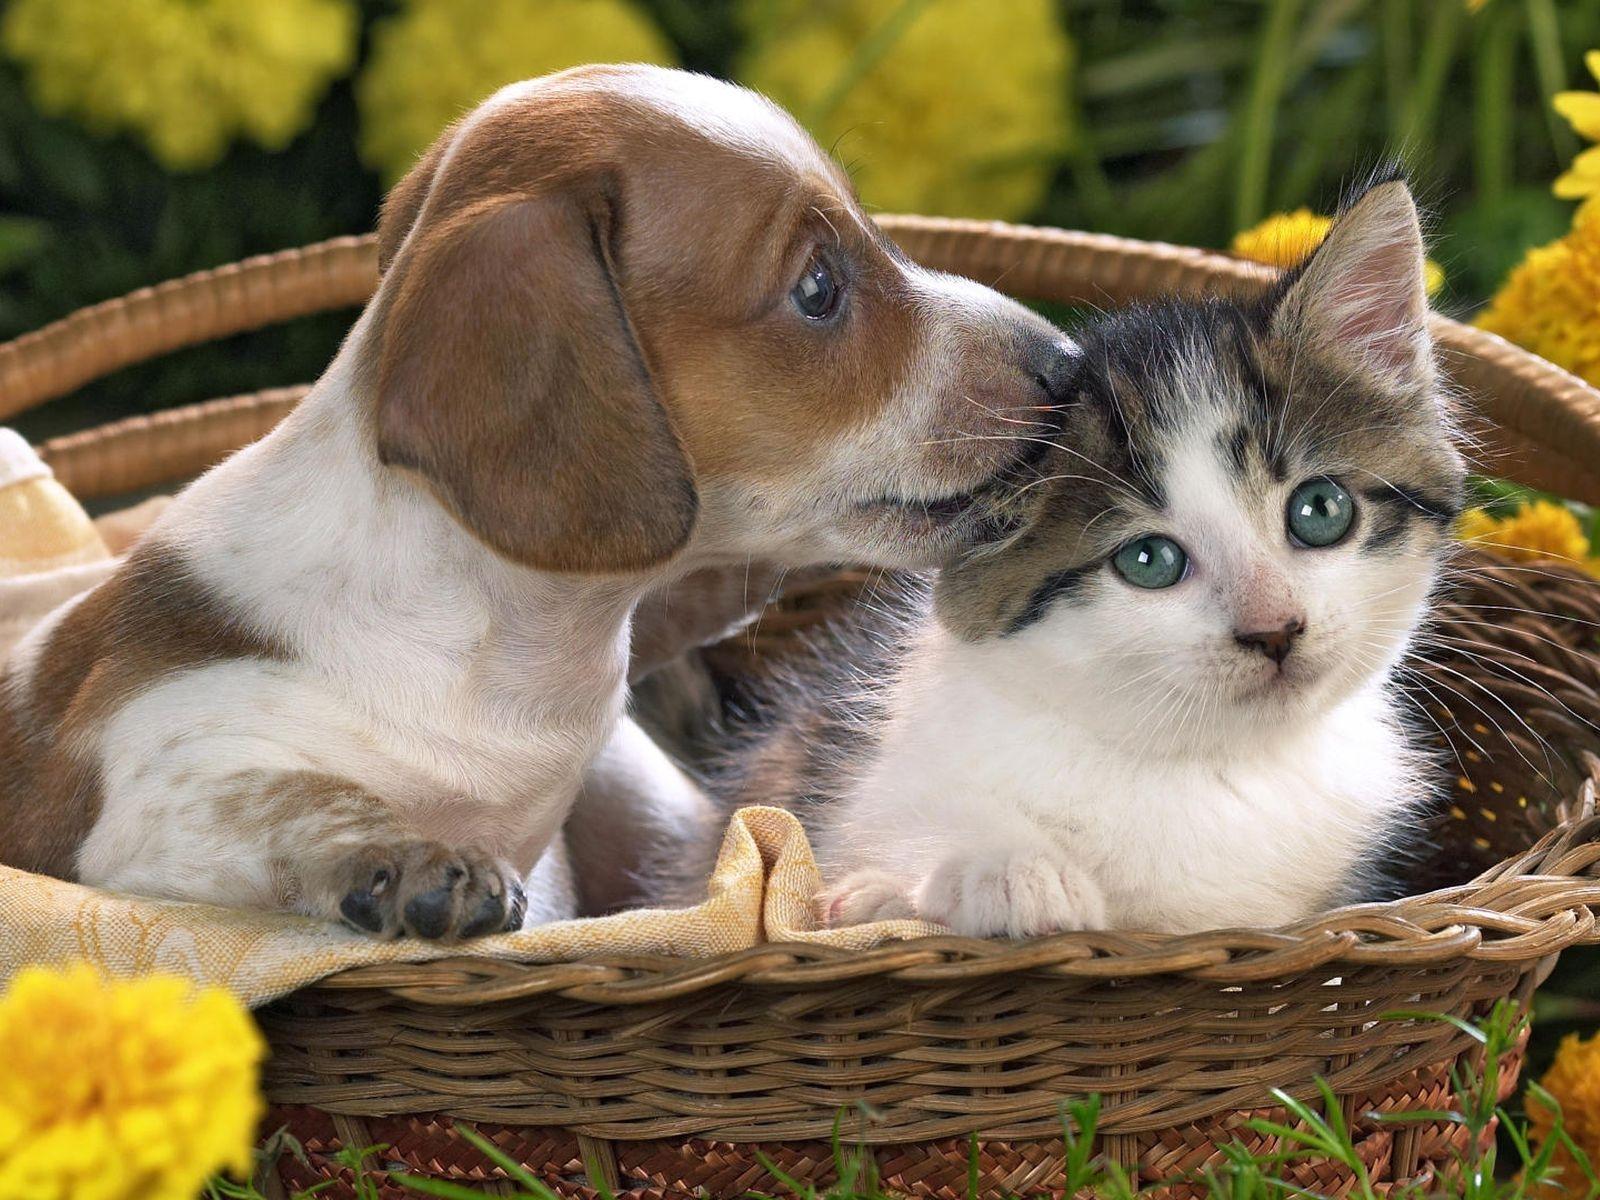 wallpaper : whiskers, basket, puppy, kitten, care, taking, cat like